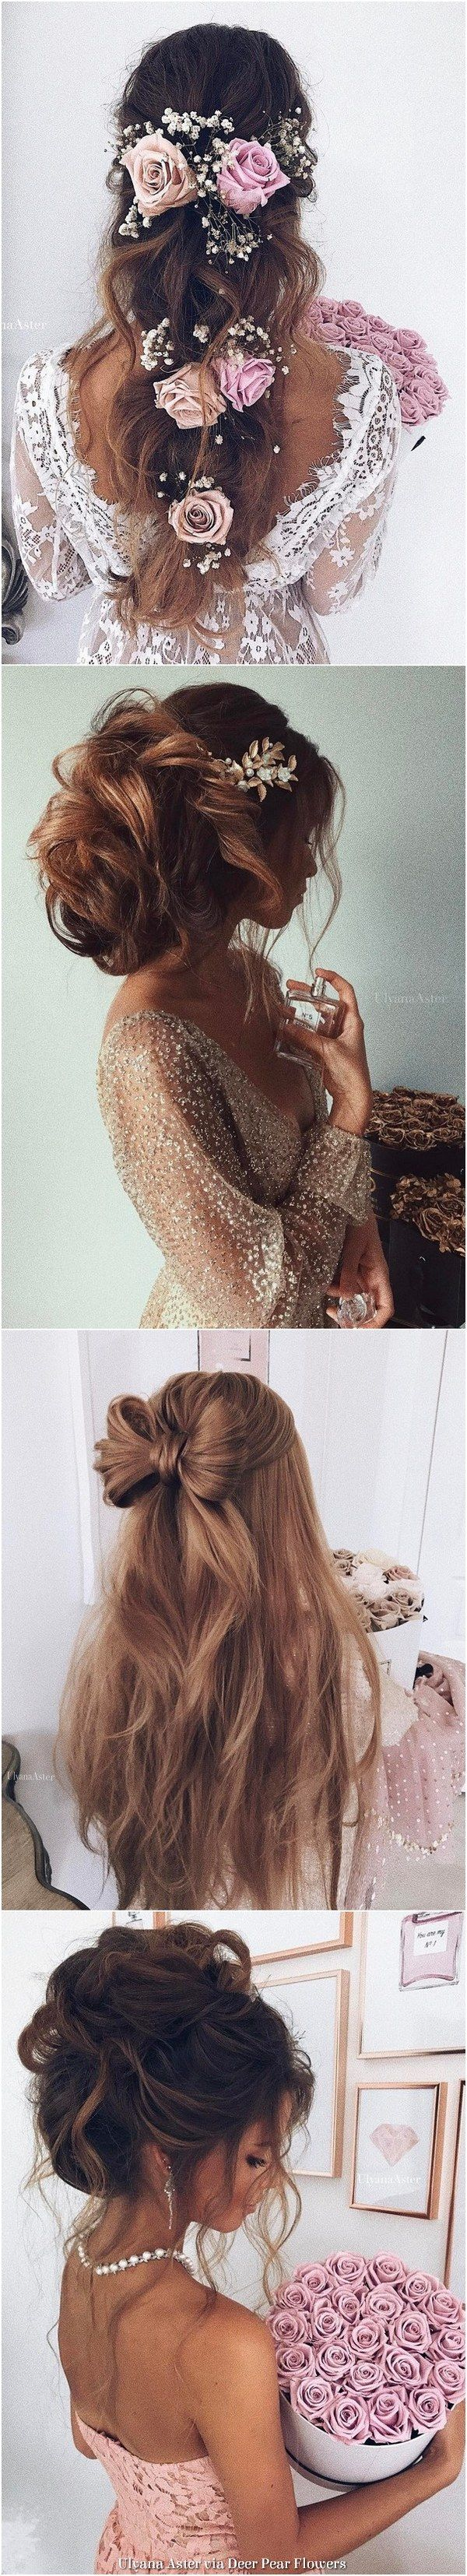 Ulyana Aster Wedding Hairstyles Inspiration - www.ulyanaaster.com | Deer Pearl F...